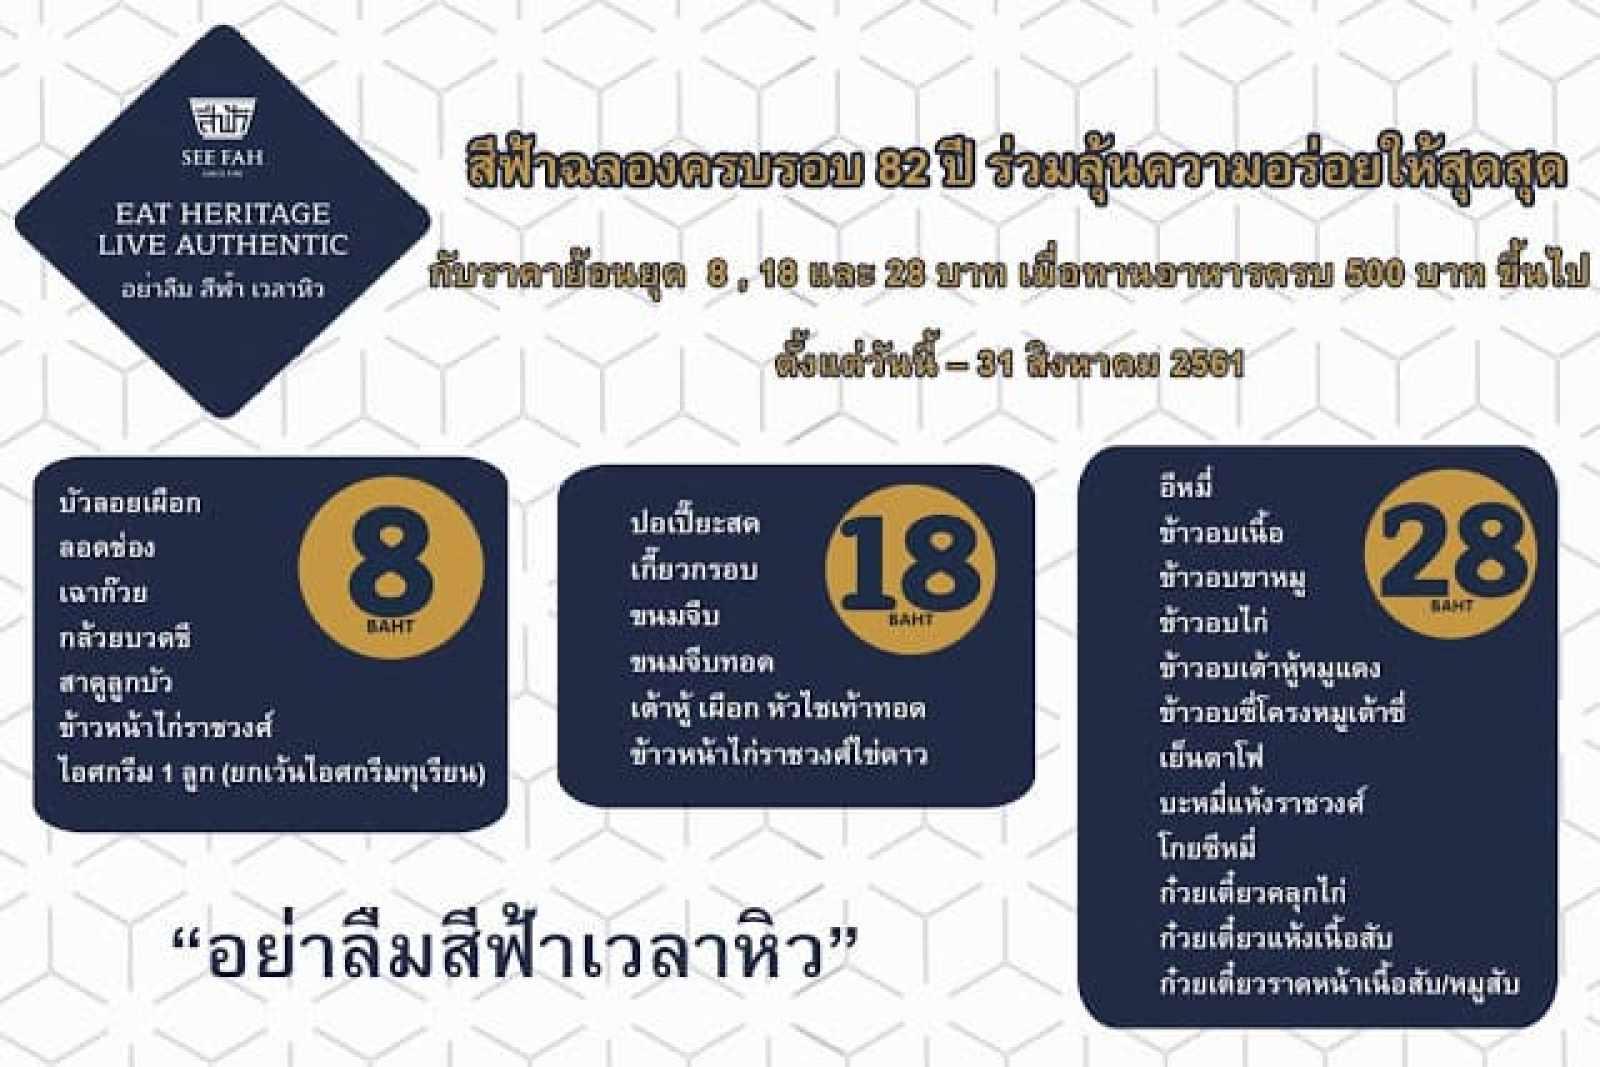 - 02 Seefah 82 Anniversary News 2 - สีฟ้าฉลองครบรอบ 82 ปี กับราคาย้อนยุค 8, 18 และ 28 บาทถึงวันที่ 31 สิงหาคม 2561